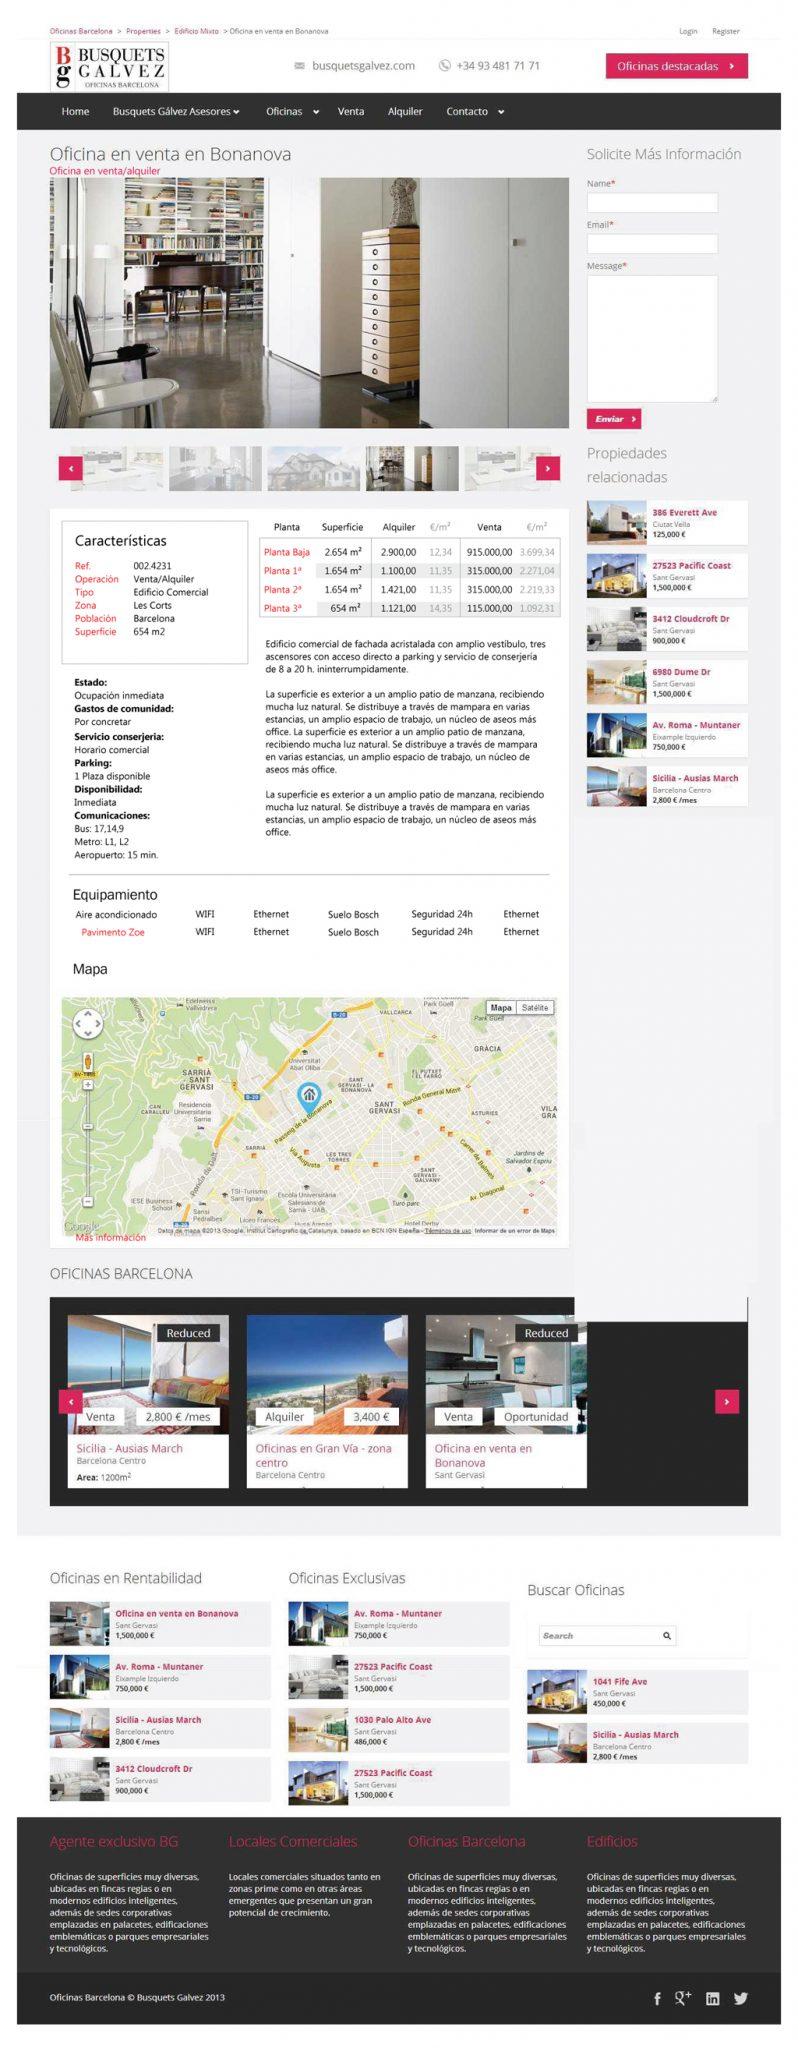 Web oficinas BG